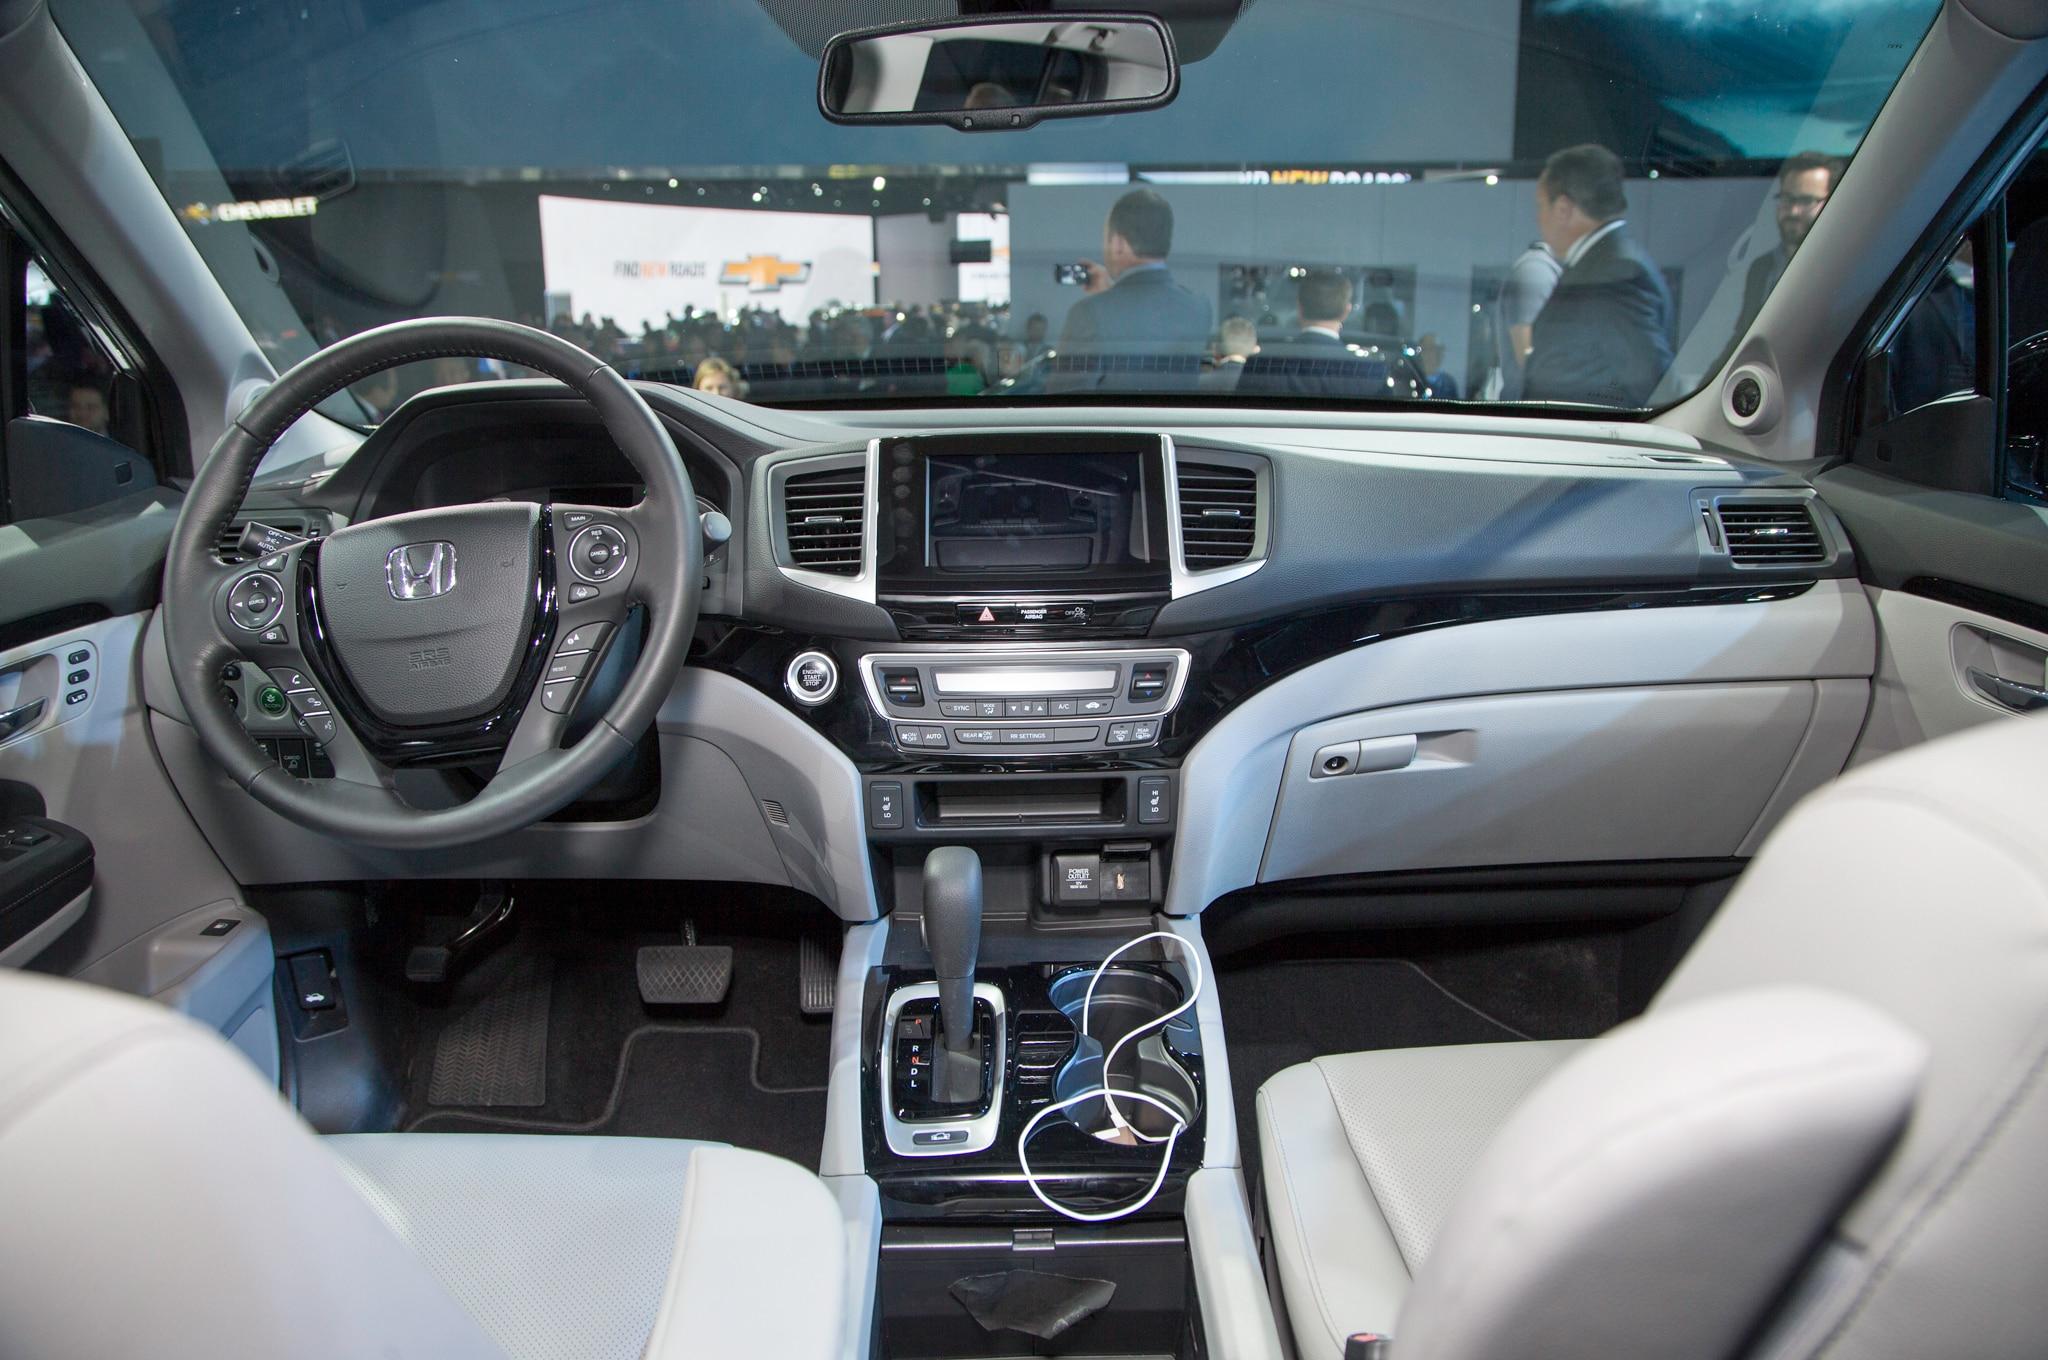 2017 honda ridgeline rated up to 26 mpg automobile magazine for 2017 honda pilot gas mileage